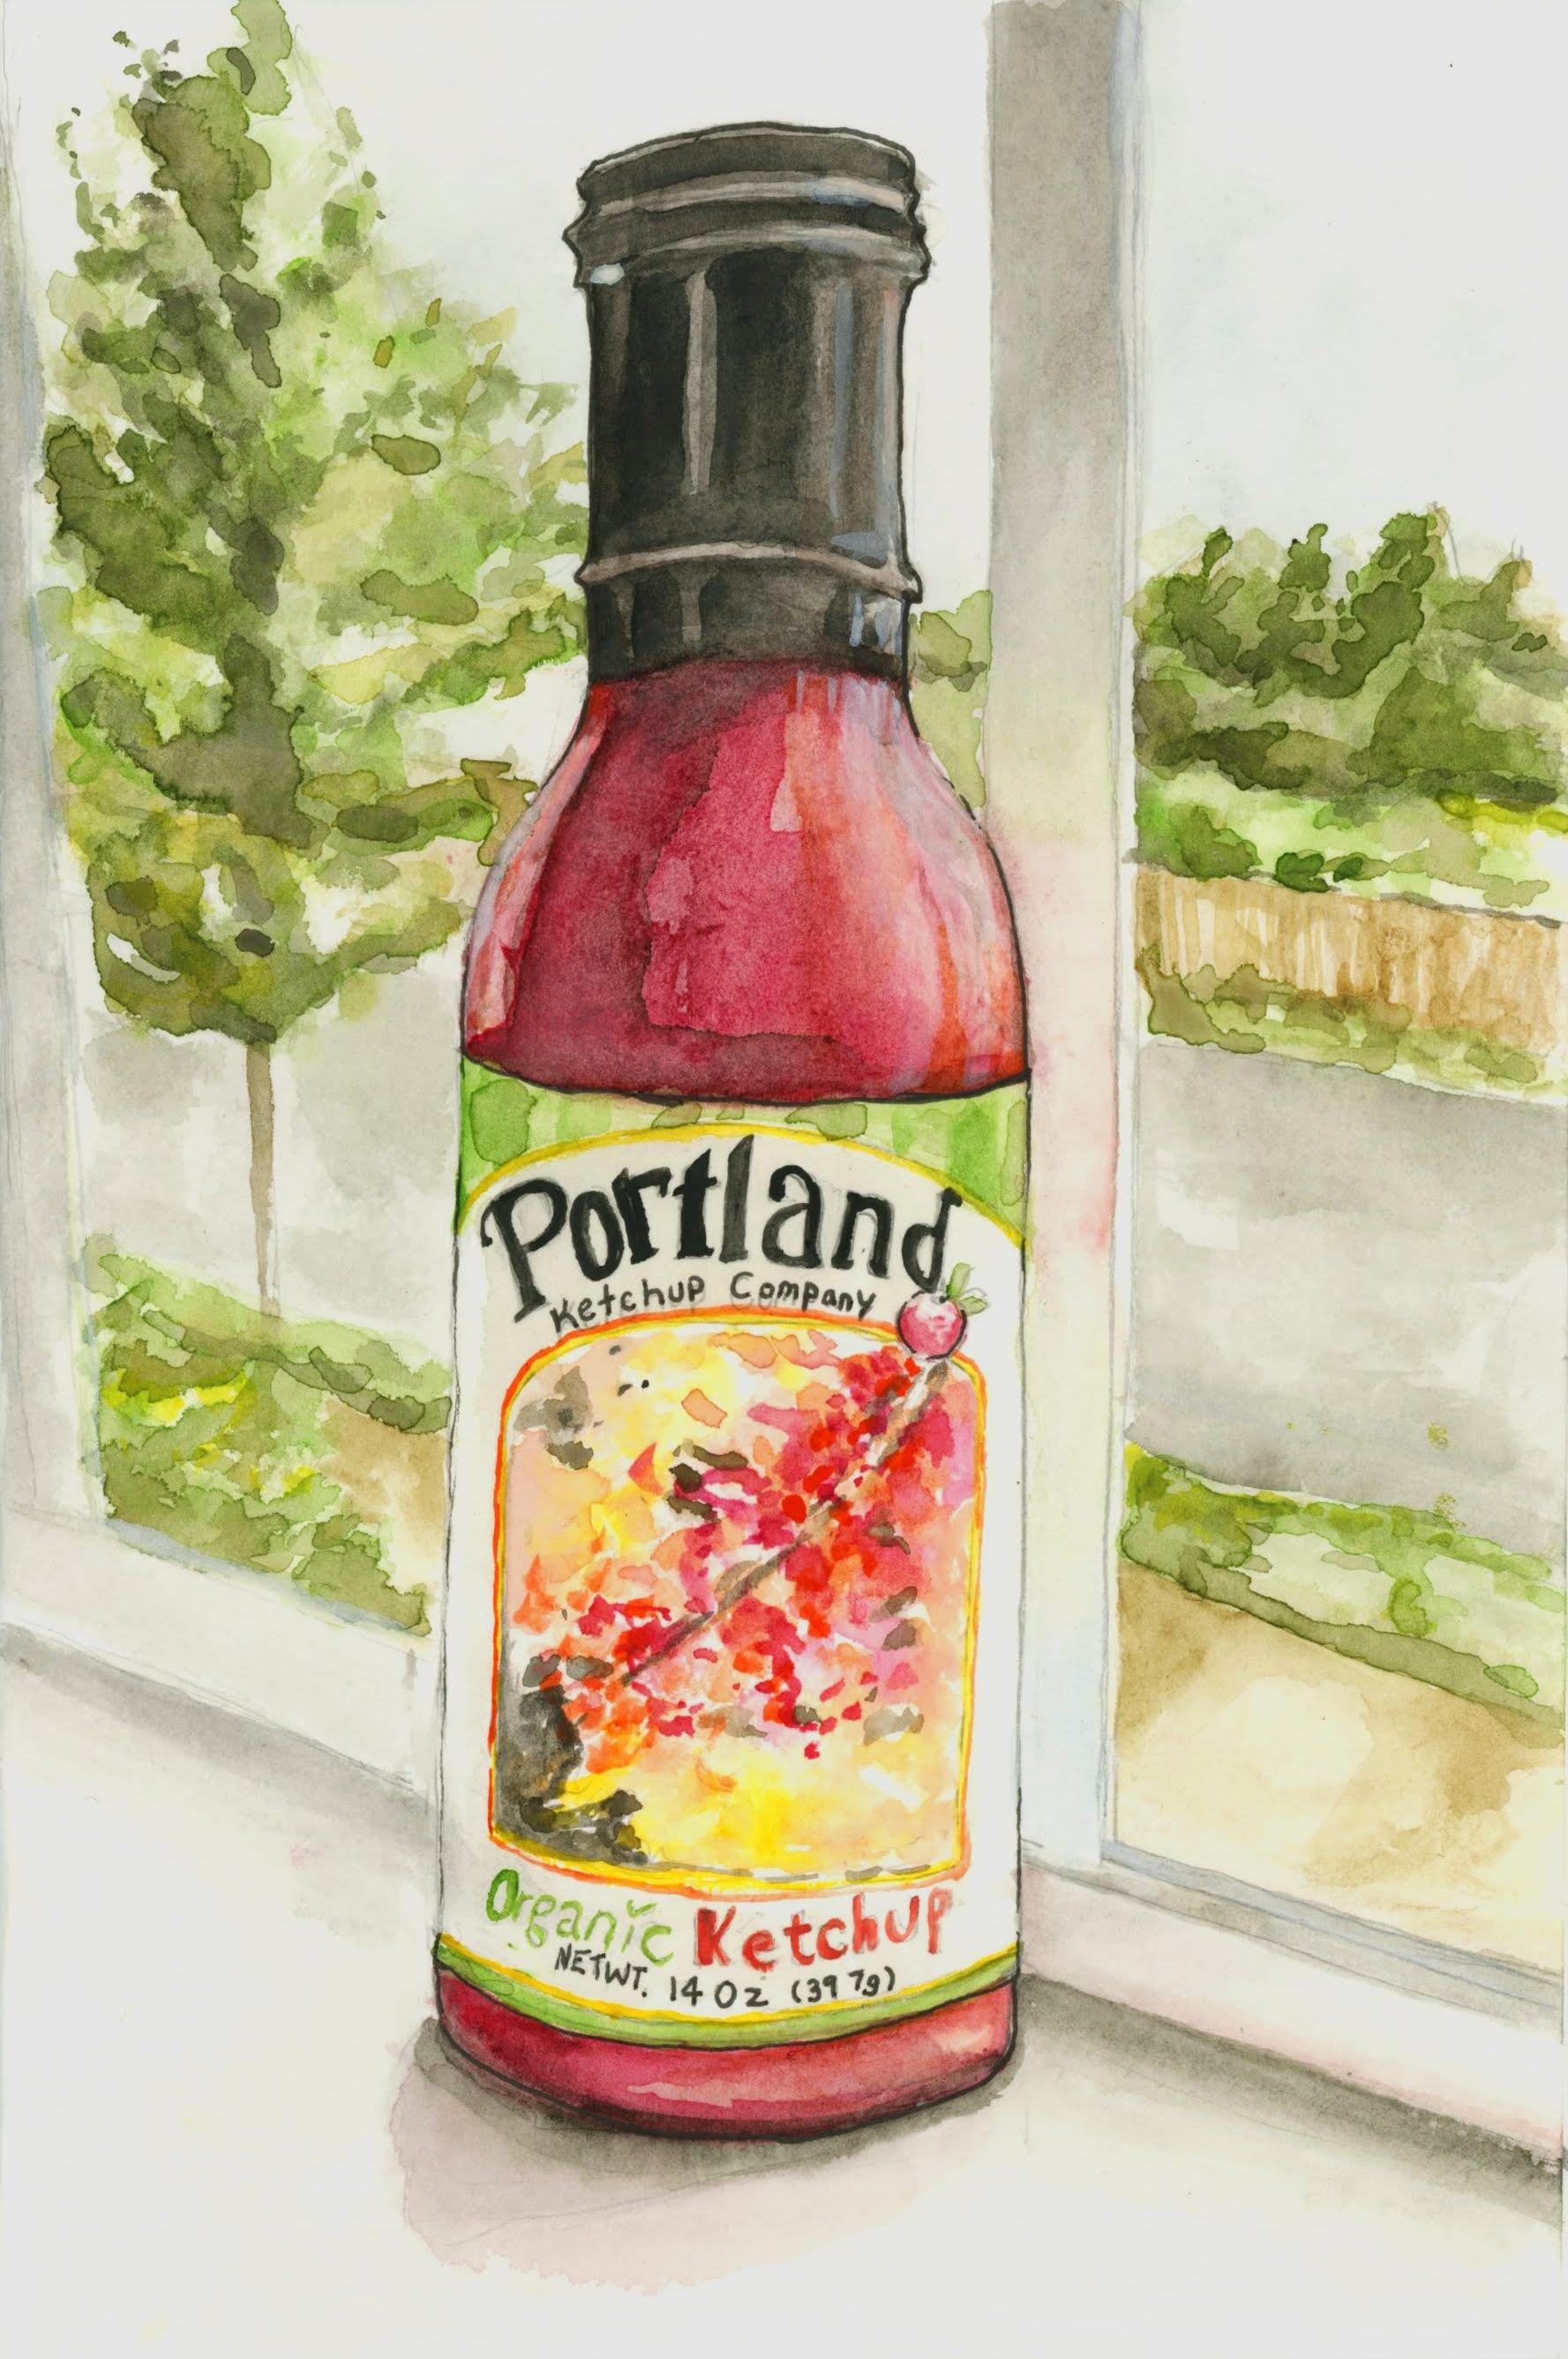 Portland Ketchup